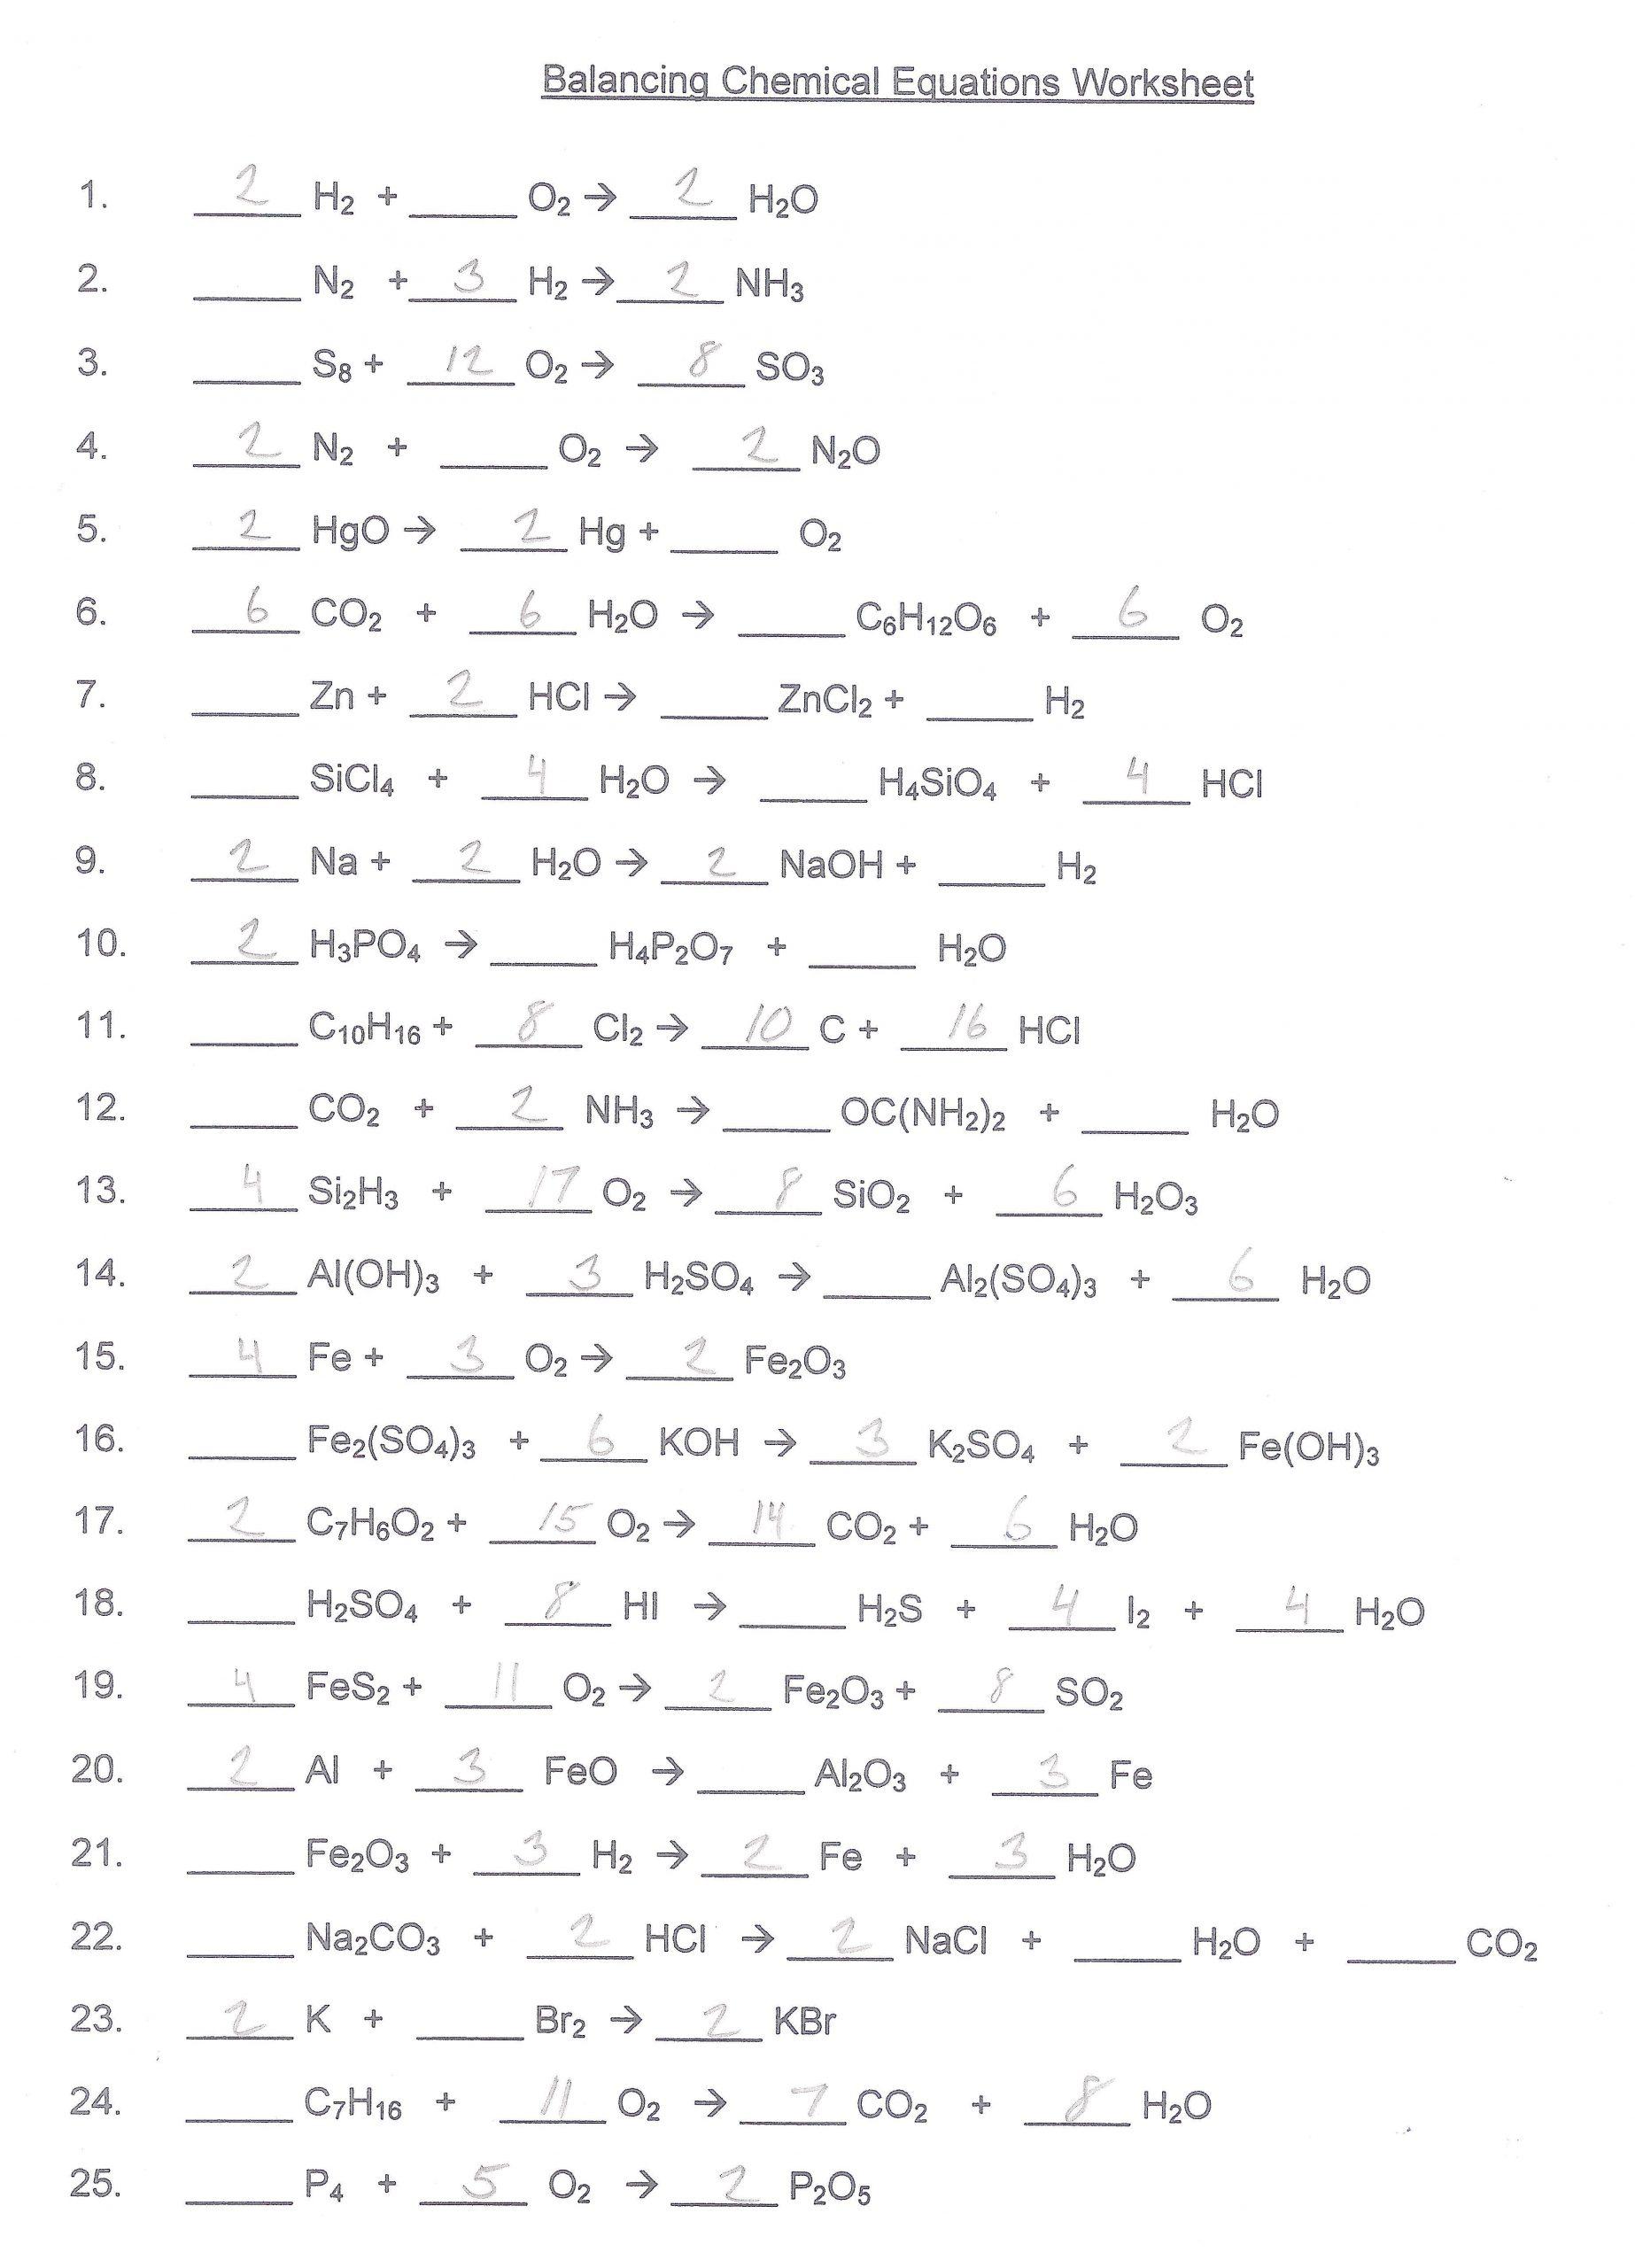 Nuclear Equations Worksheet Answers Balancing Chemical Equations Worksheet Answer Key